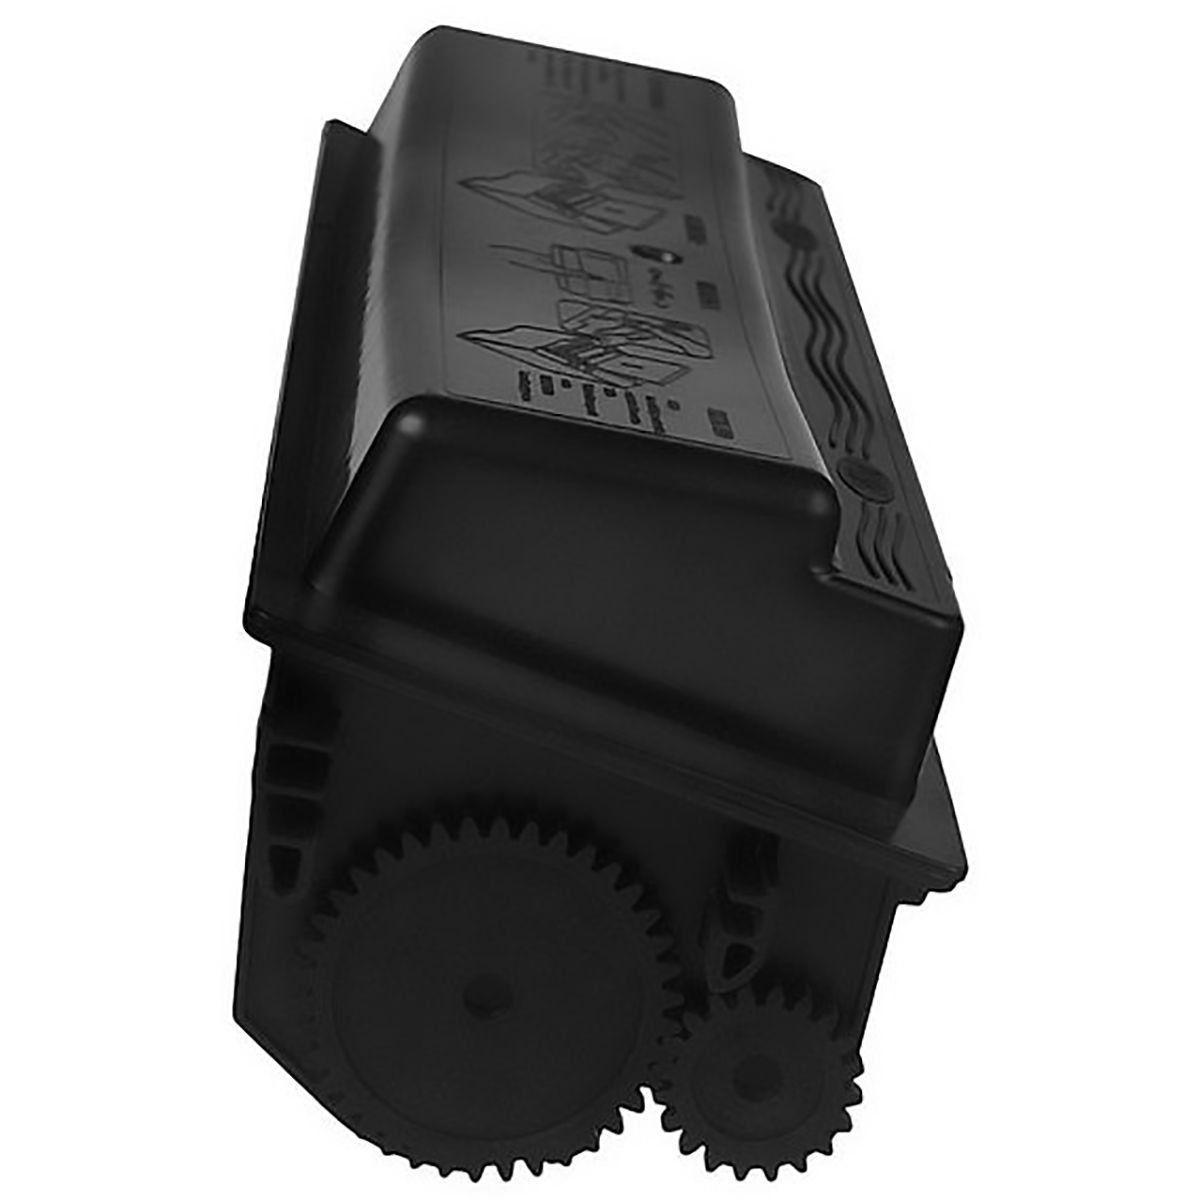 Compatível: Toner TK130 TK132 TK140 para Kyocera FS-1010 FS-1100 FS-1390 FS-1010n FS-1300d FS-1128mfp / Preto / 7.200